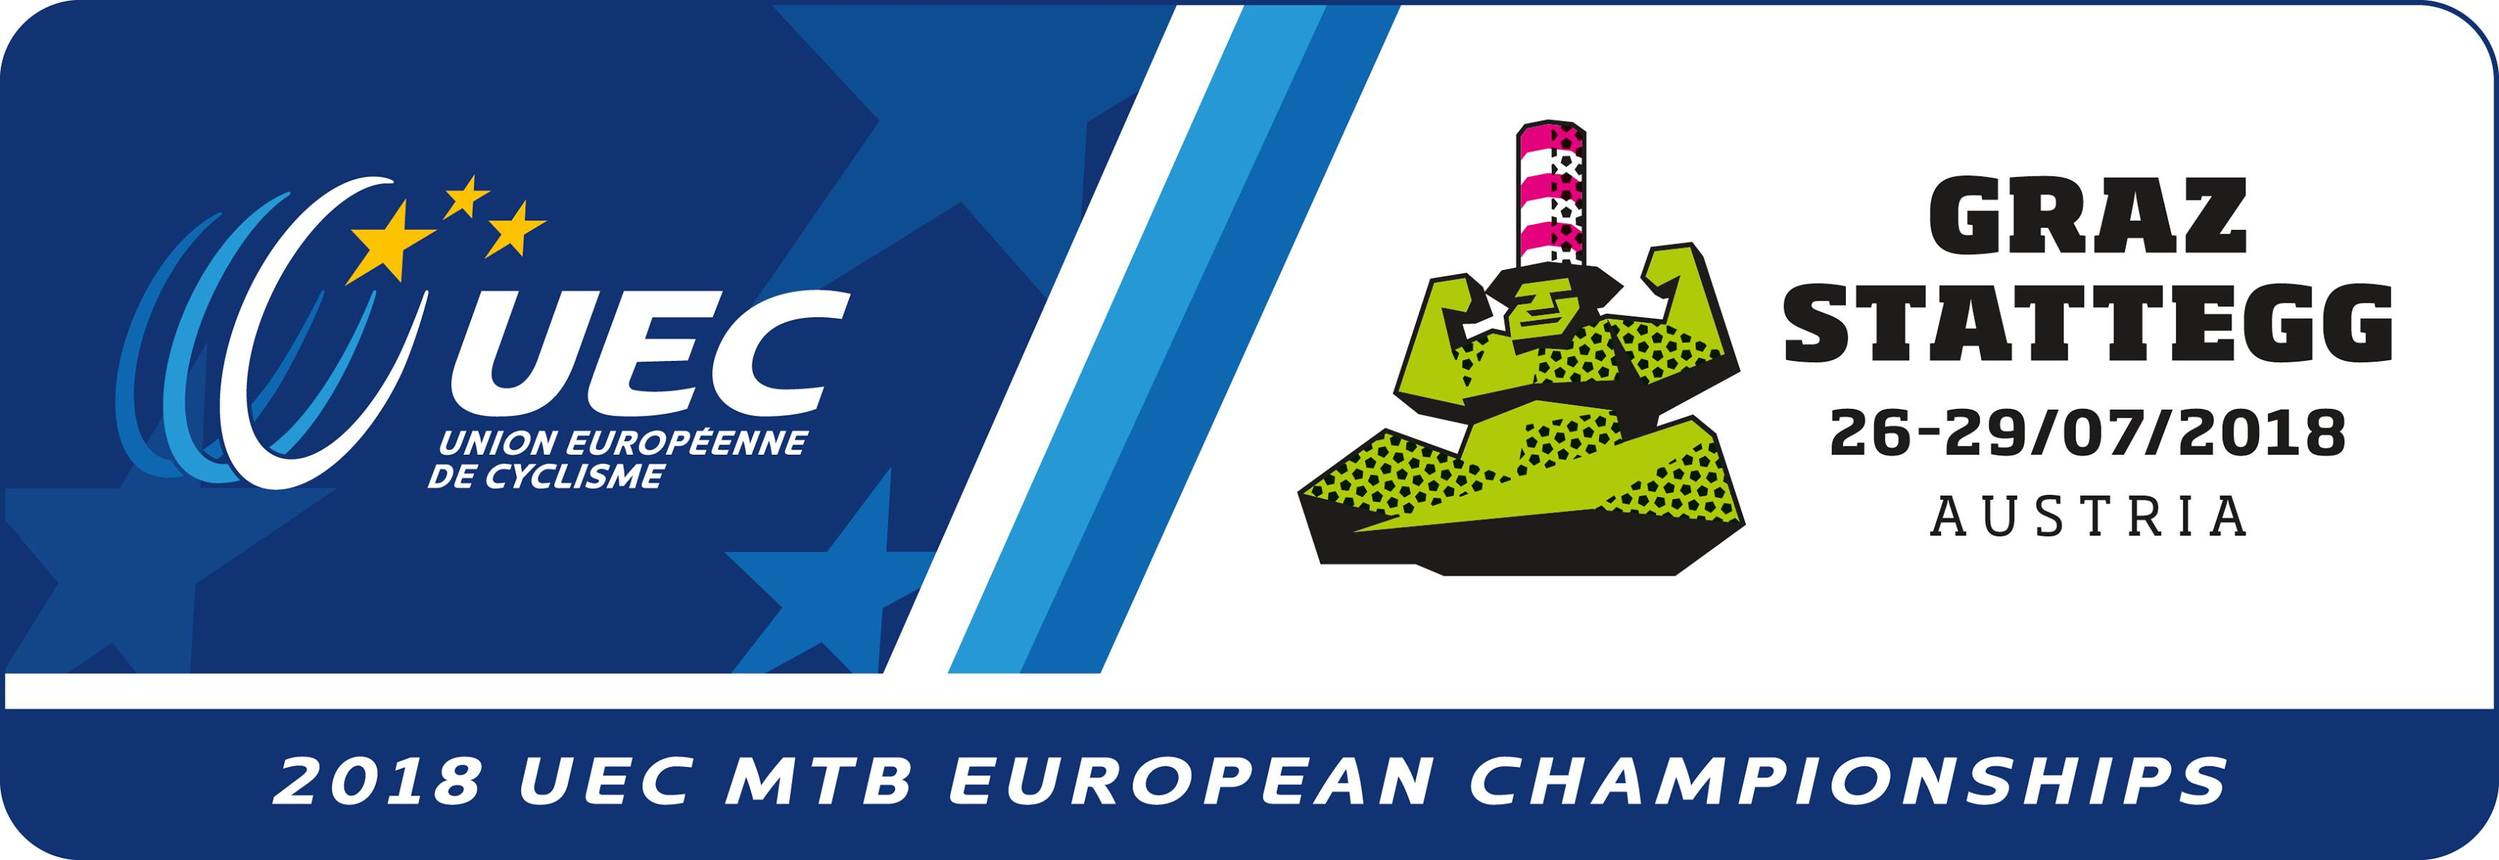 UEC European Mountain Bike Championship